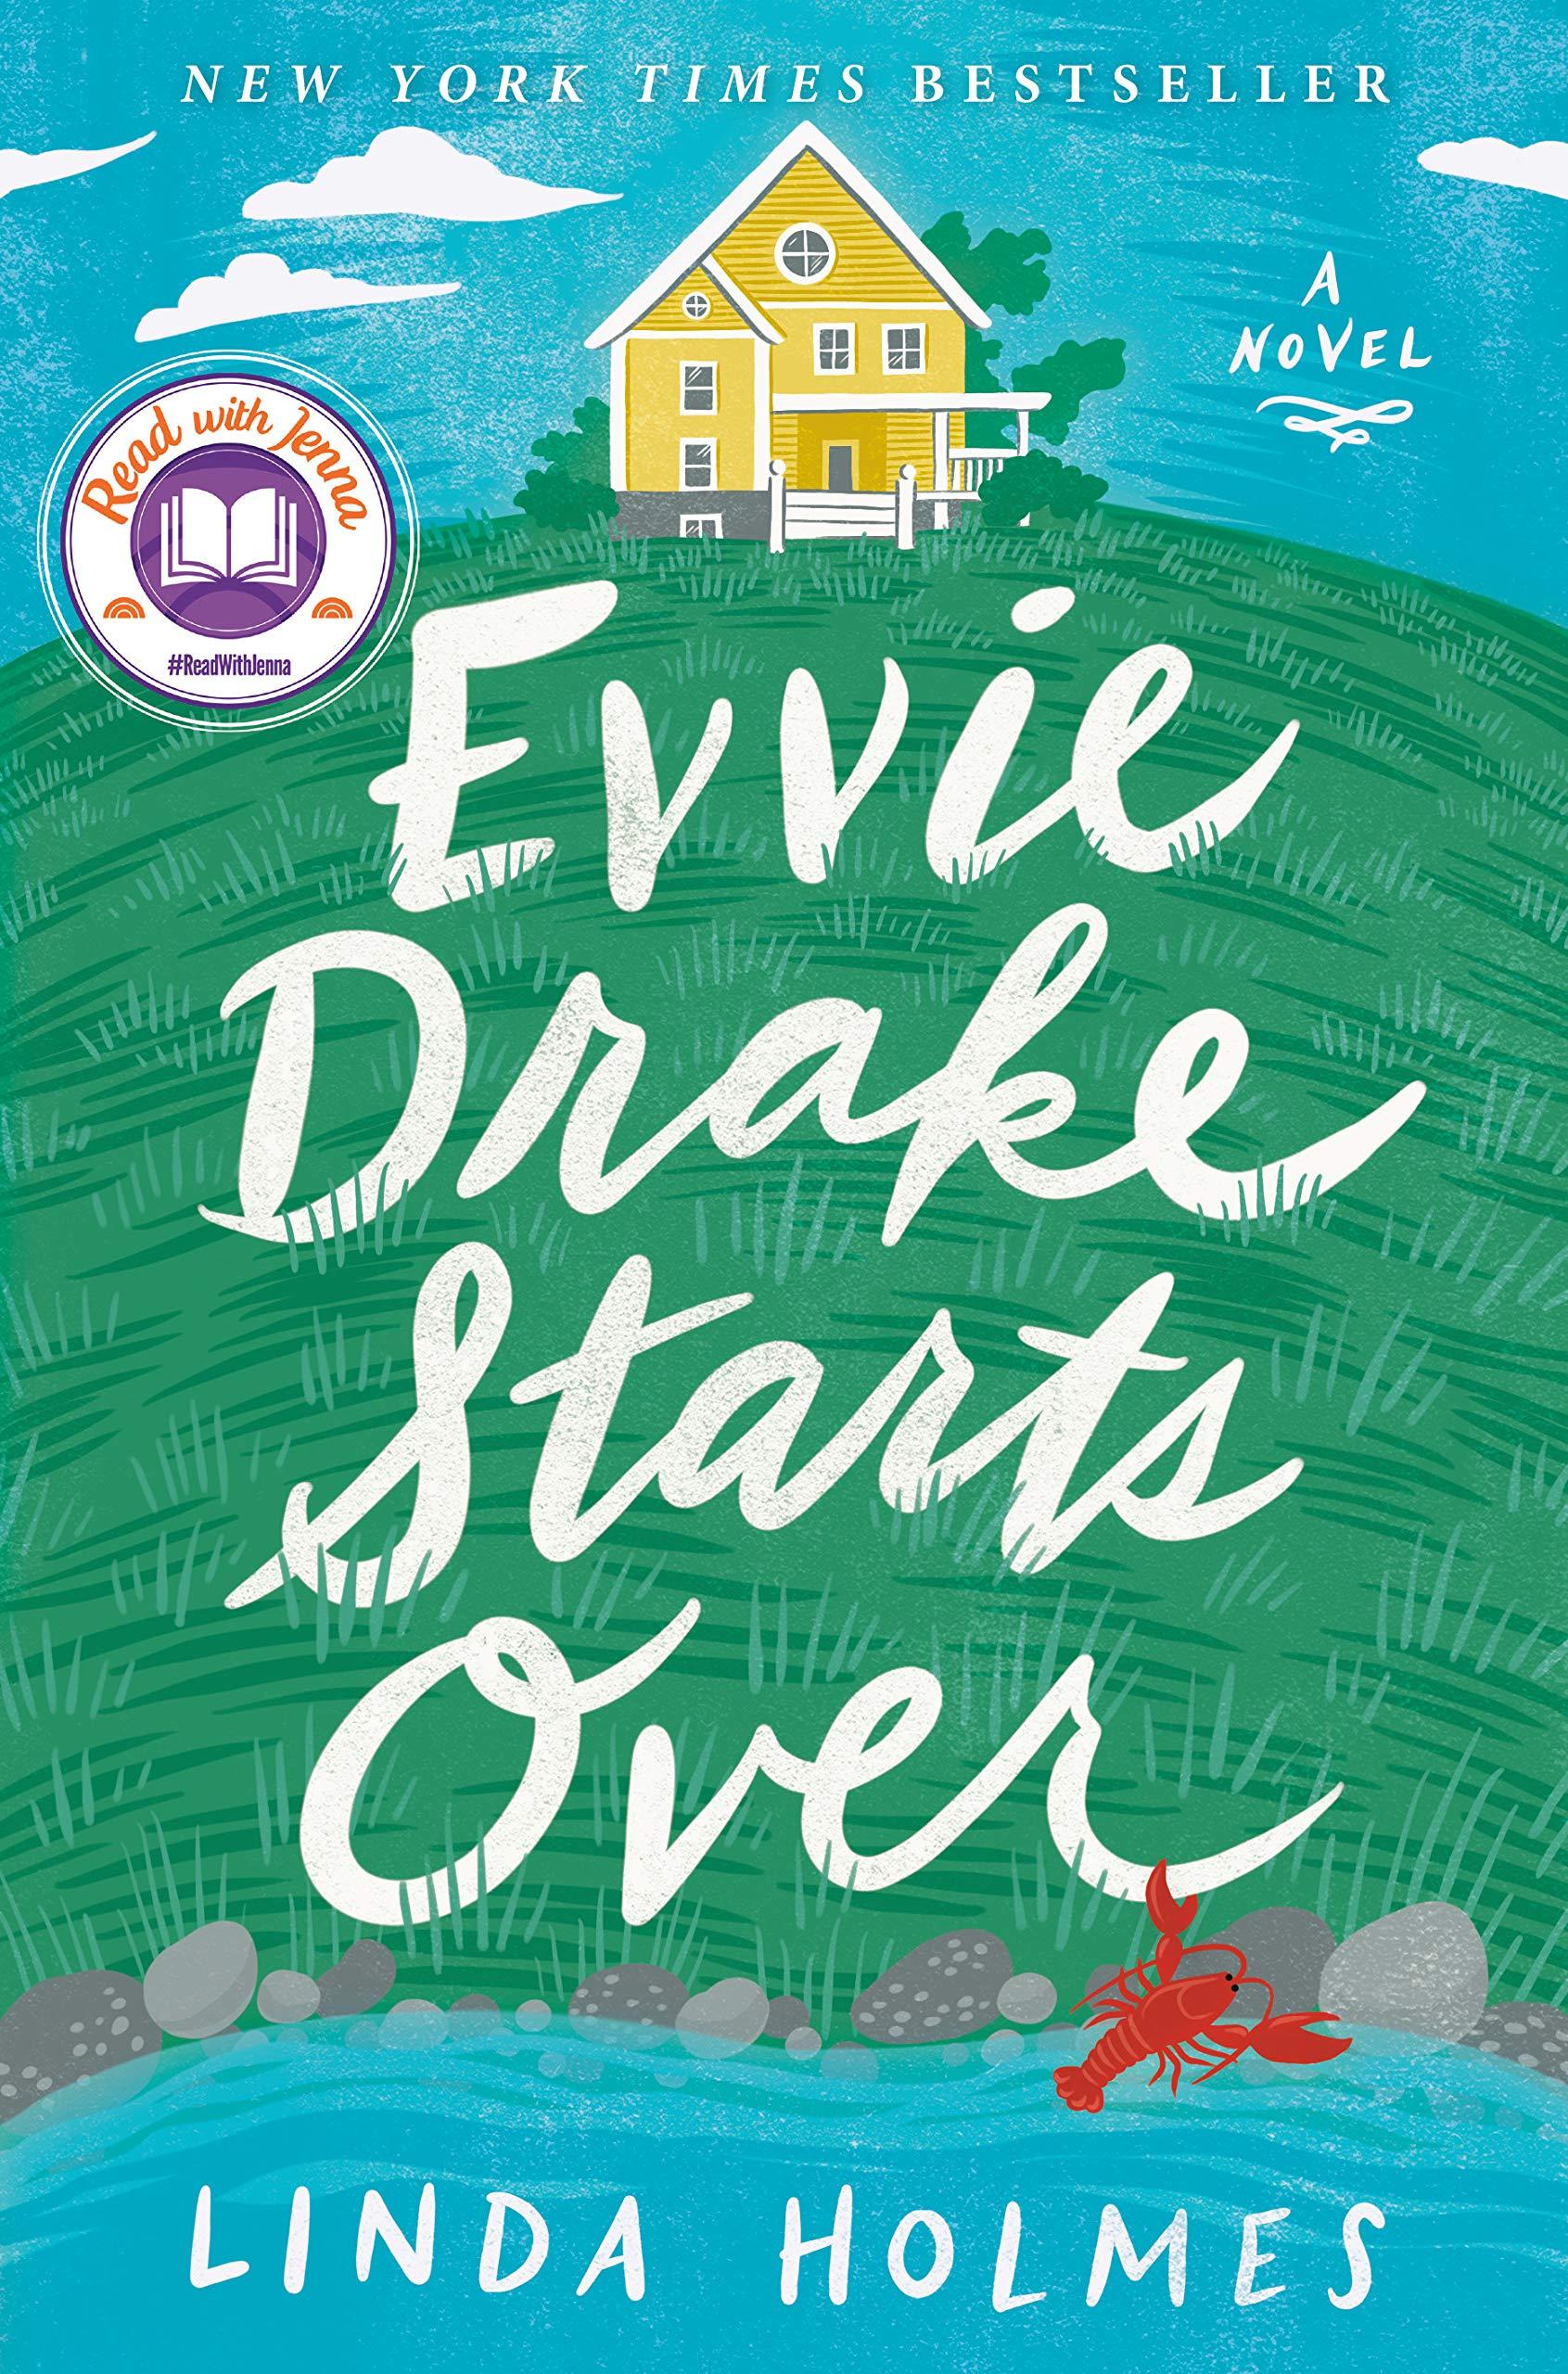 Evvie Drake Starts Over: A Novel: Holmes, Linda: 9780525619246 ...